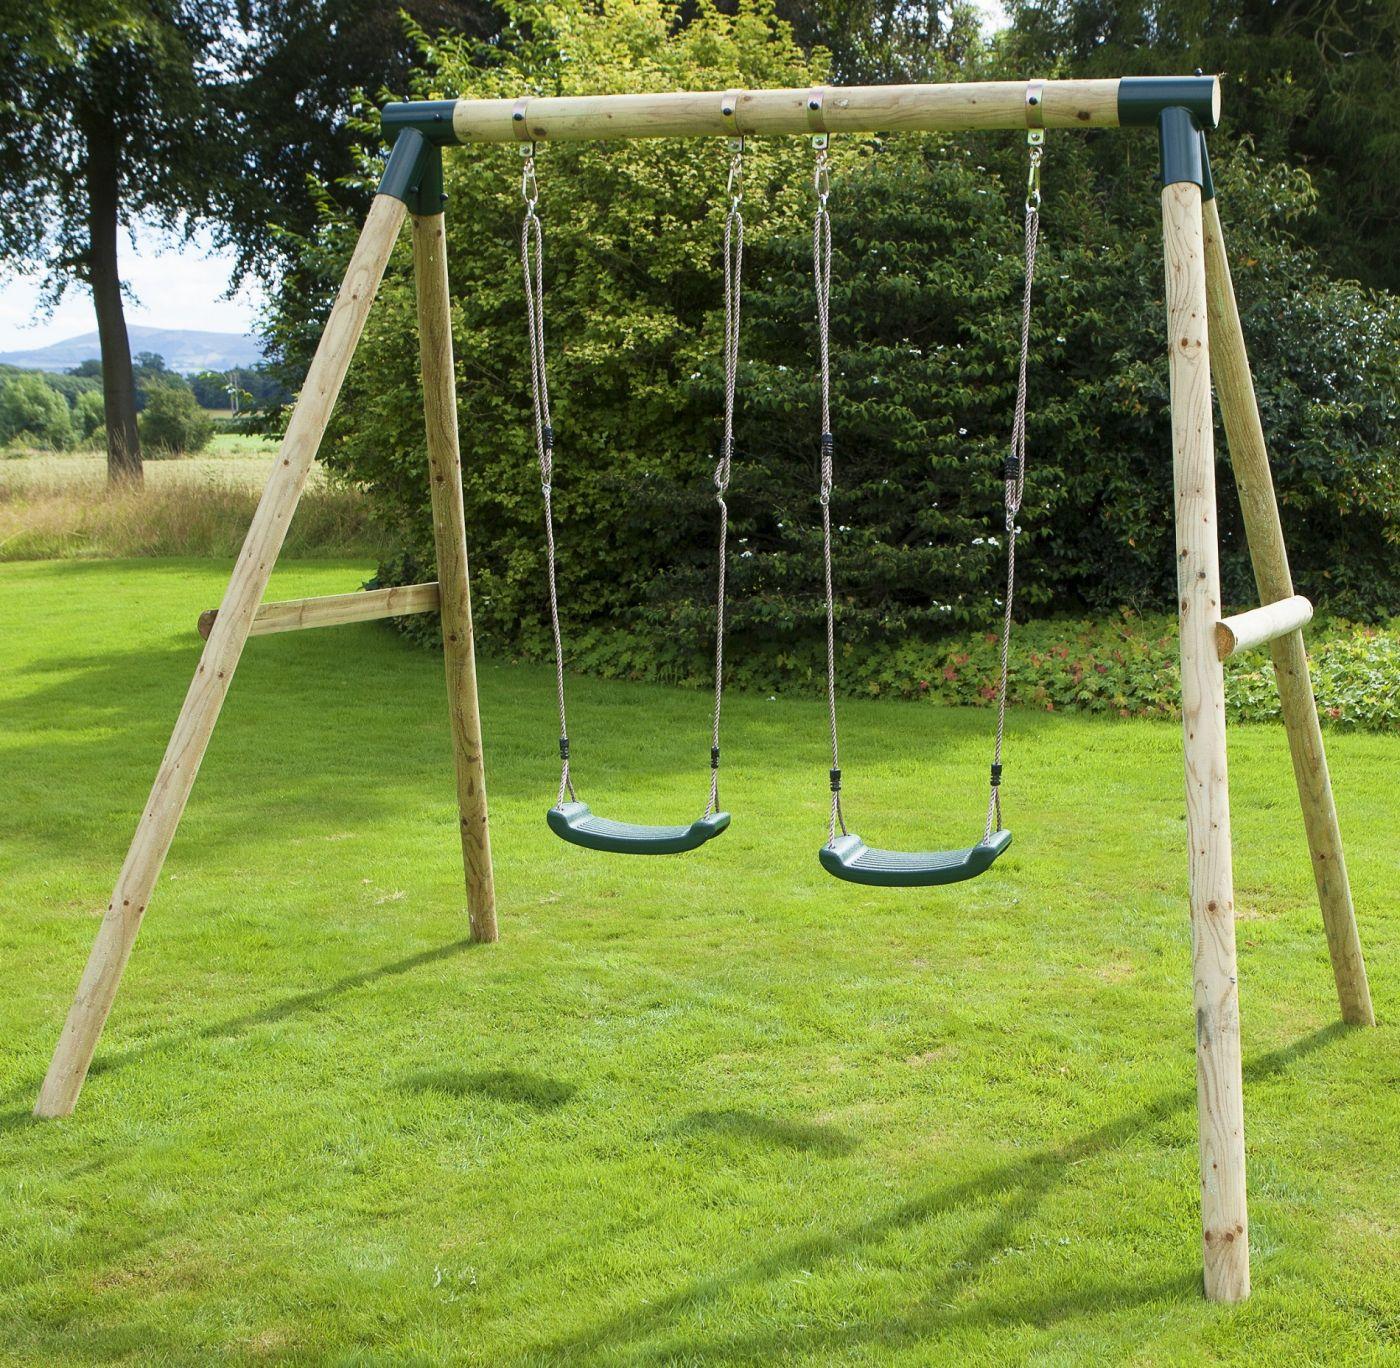 Rebo Venus Wooden Garden Swing Set For Just 14995 Outdoor Toys